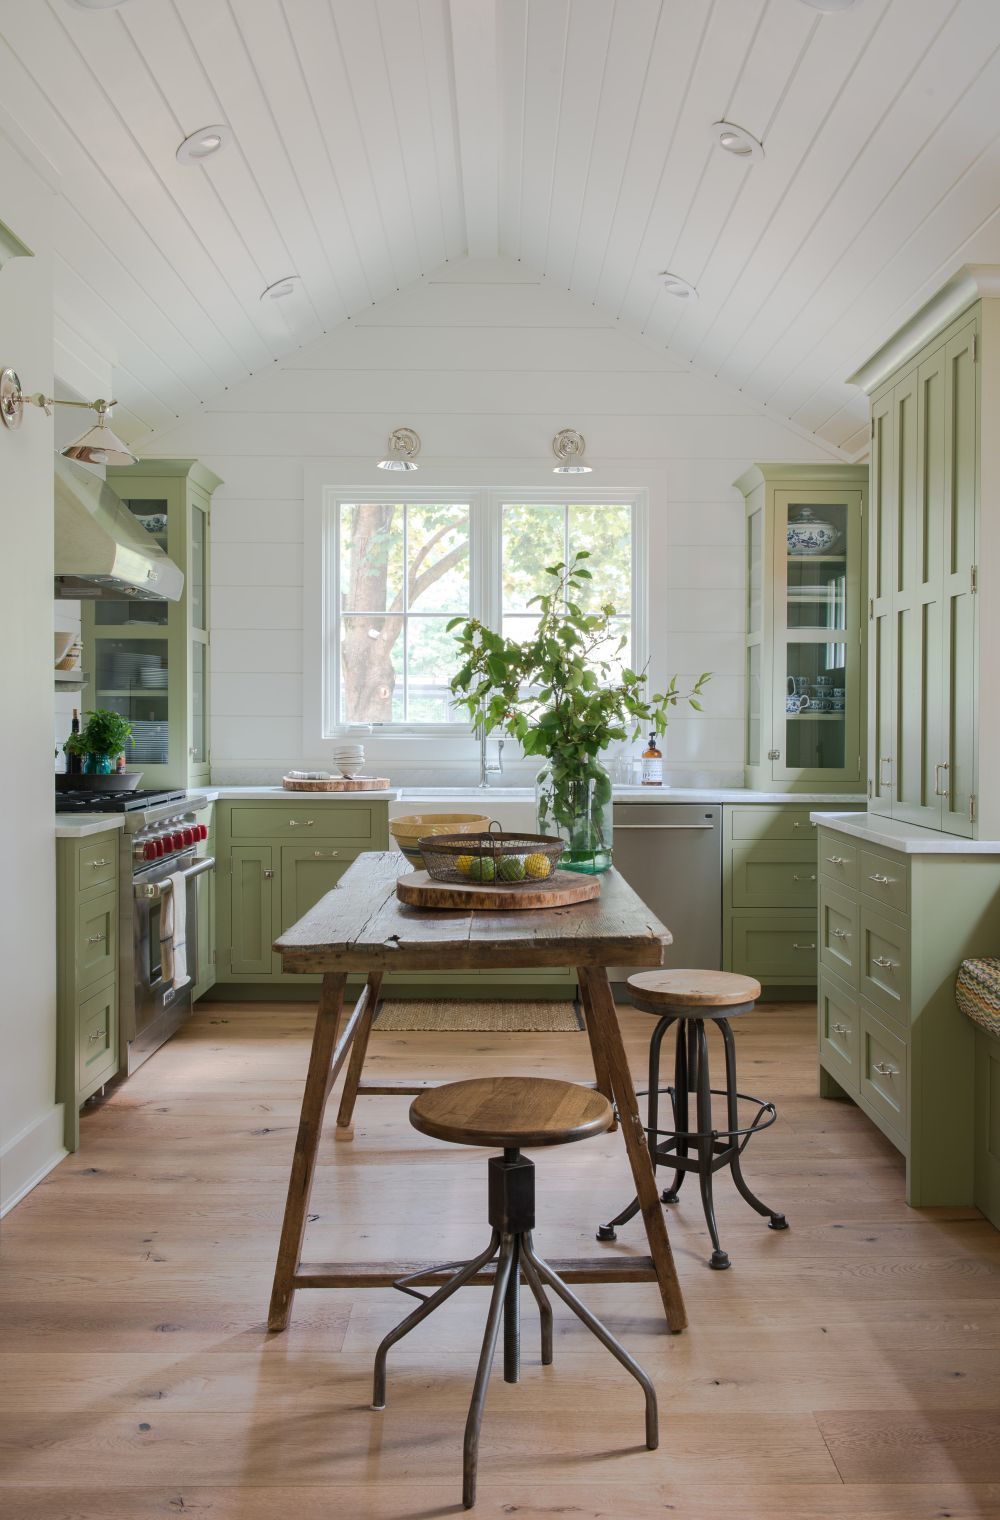 adelaparvu.com despre casa din lemn cu interior rustic actual, Design Kelly Mittleman, arch Mark Finlay, Foto Jane Beiles (8)